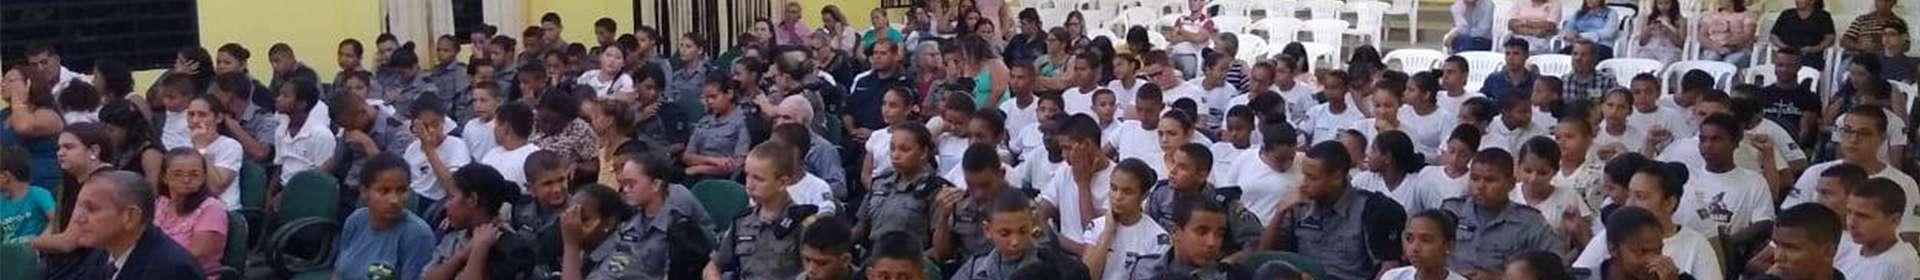 Alunos da Guarda Mirim de Machadinho d'Oeste, RO, participam de culto a Deus